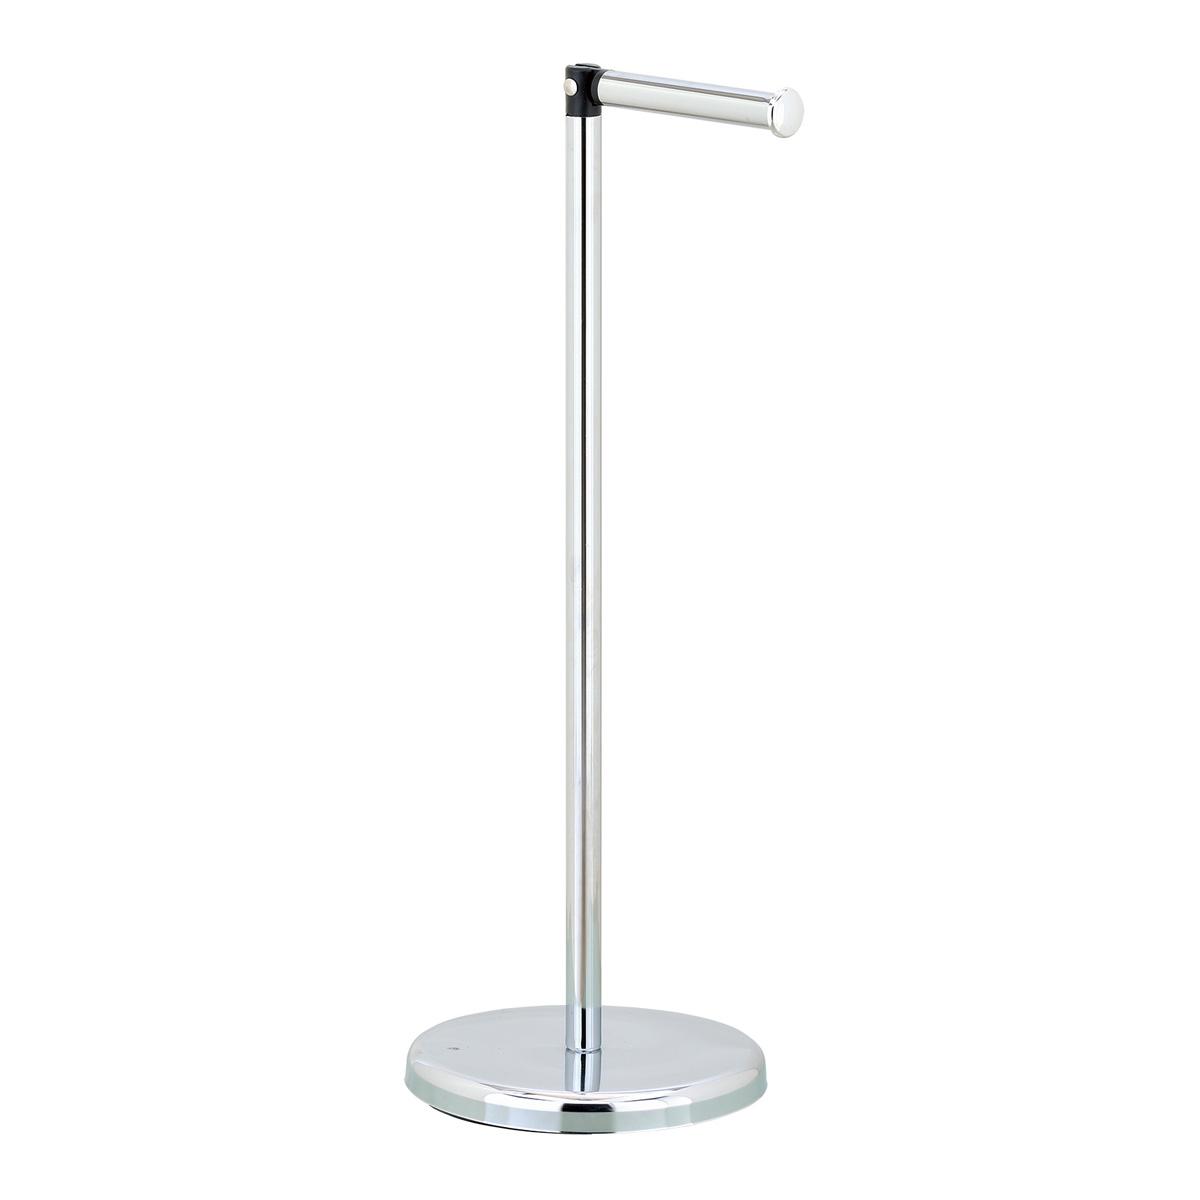 Organizador Pedestal Para Papel Higienico Or-434788 Namaro